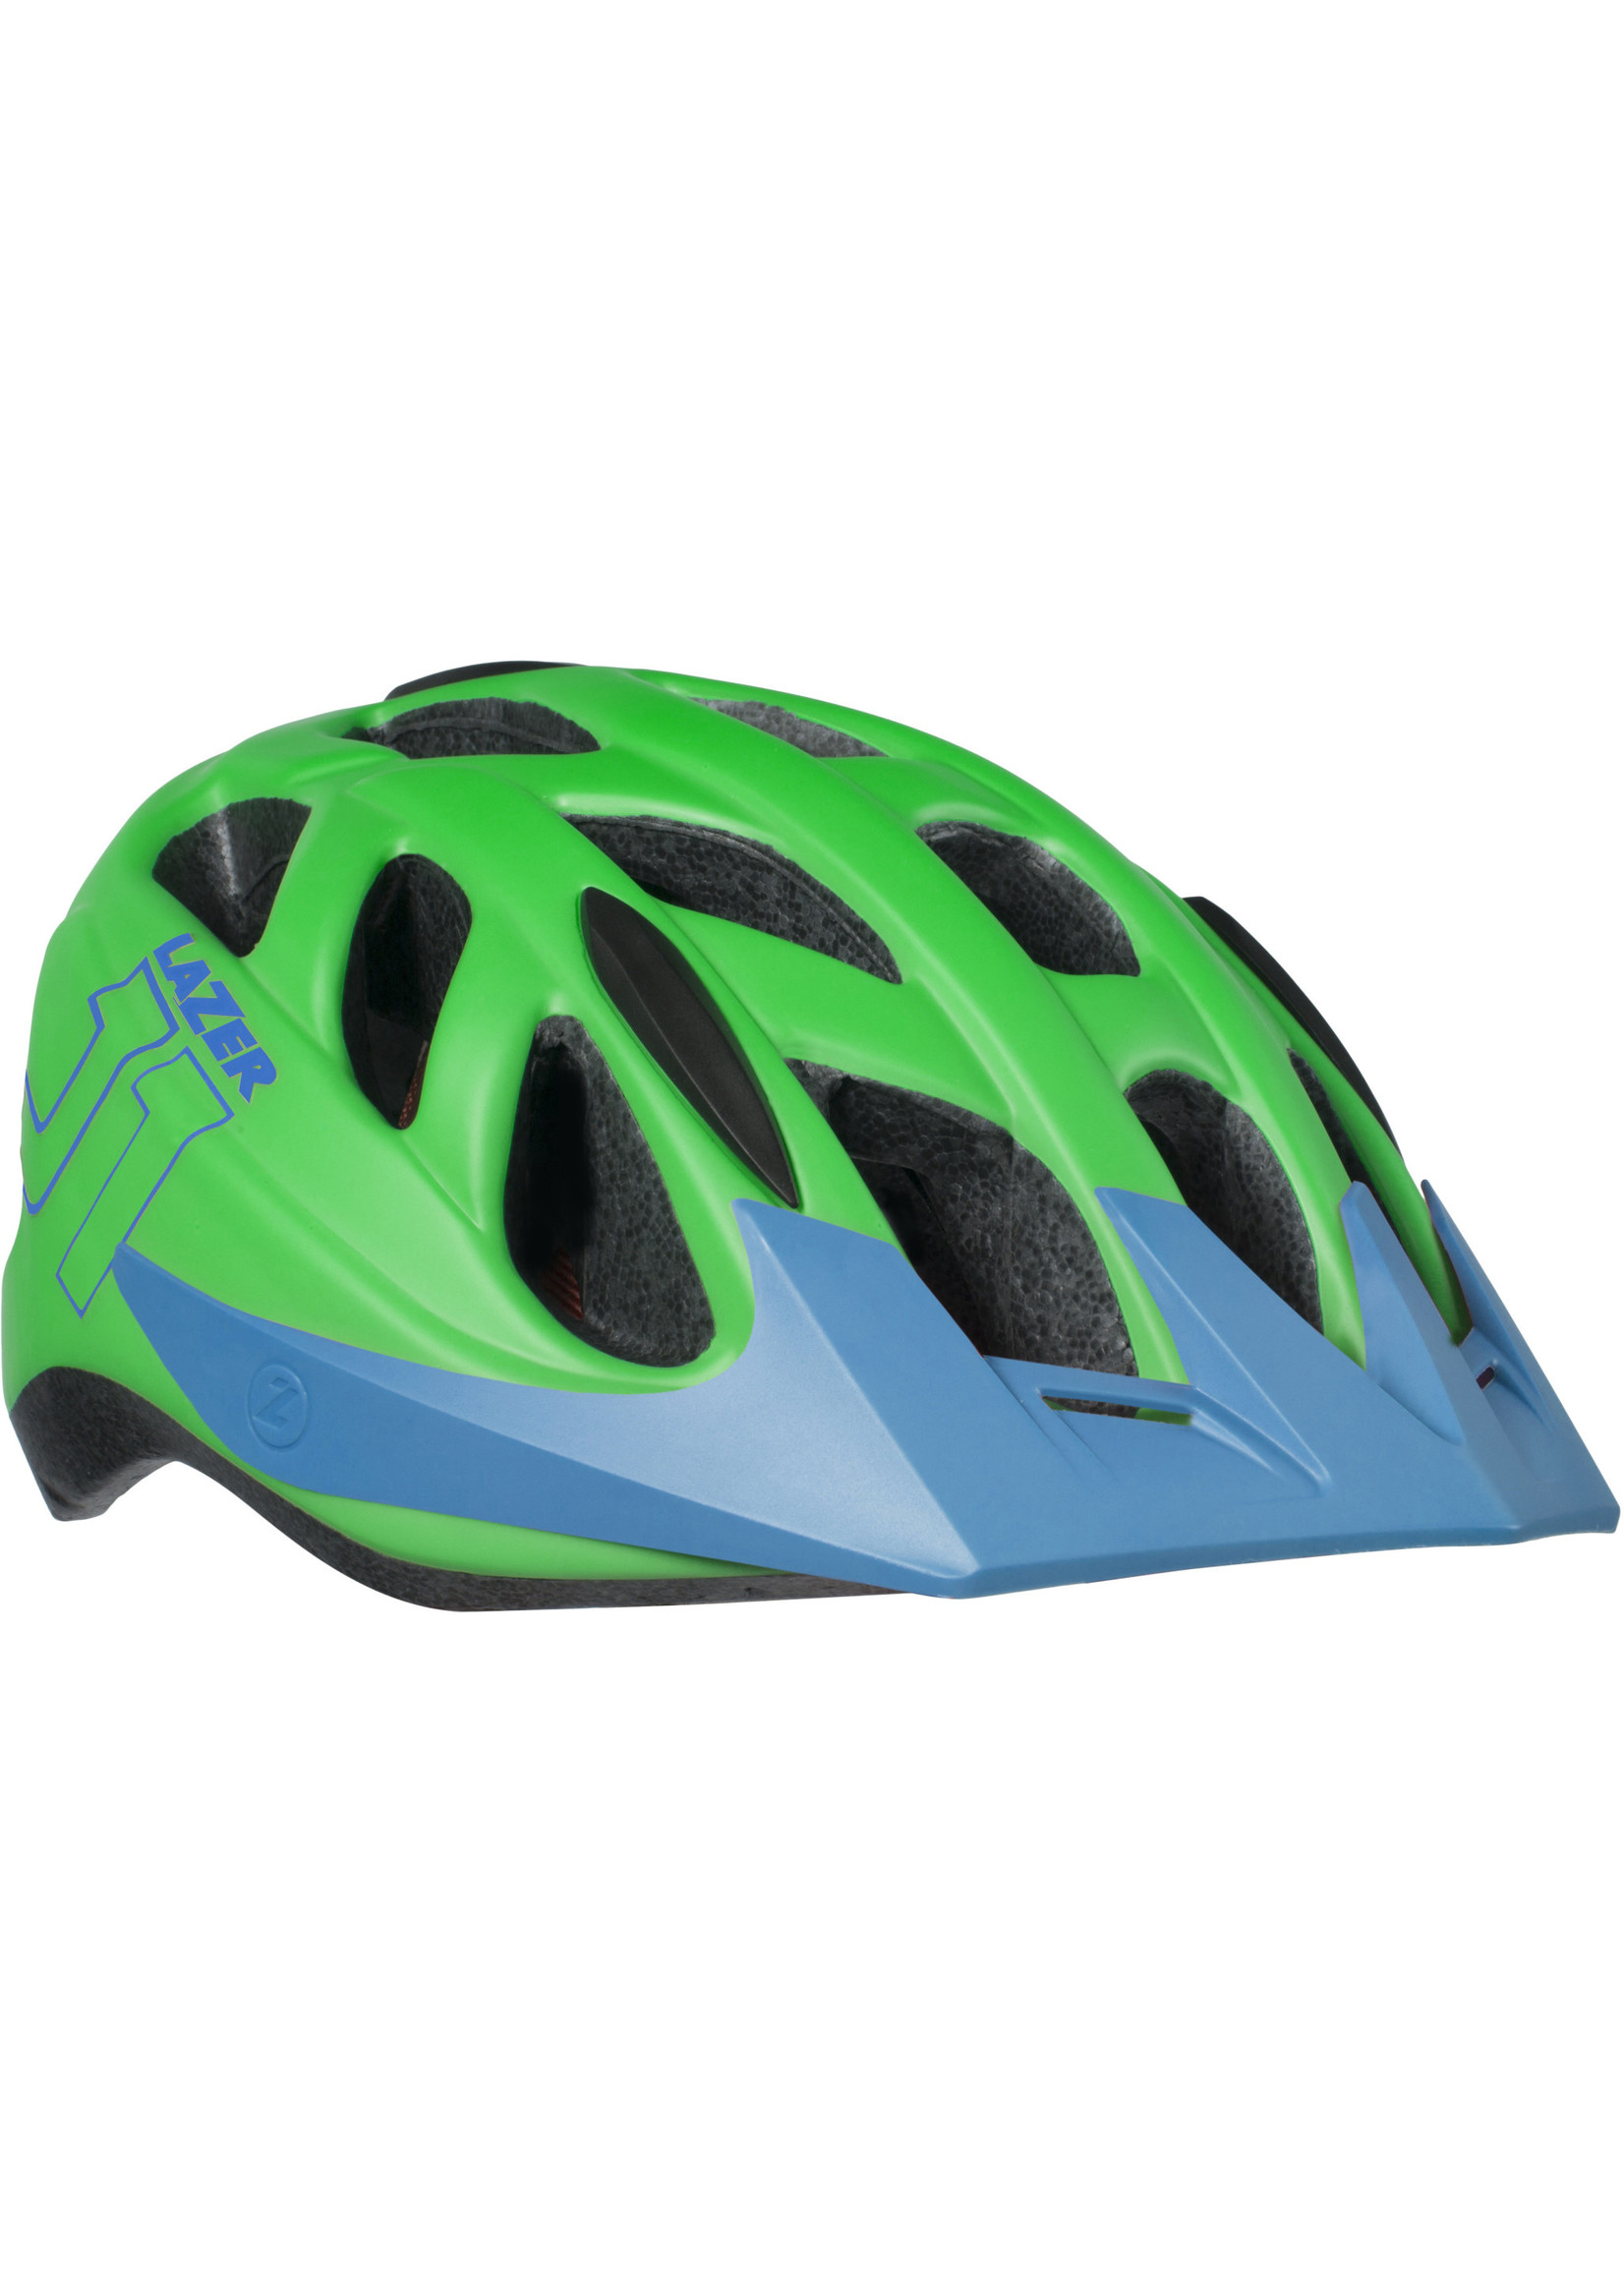 Lazer J1 Helmet, Green/Blue, Uni-Youth